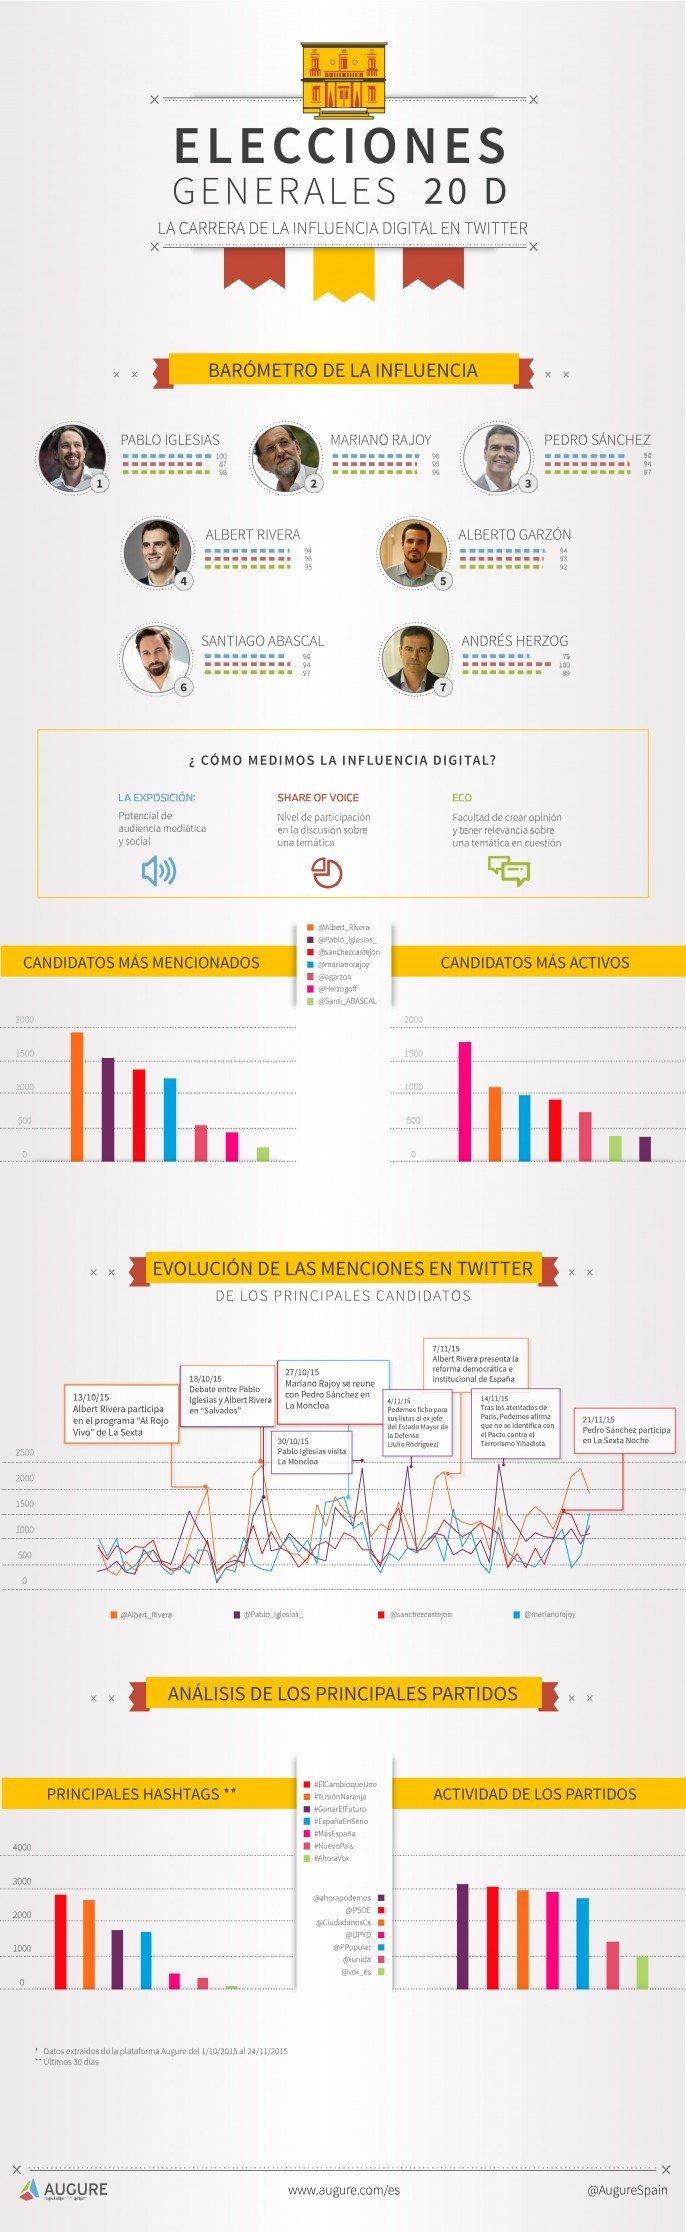 Elecciones-Generales-Espana-2015-Augure-influencia-digital-686x2232